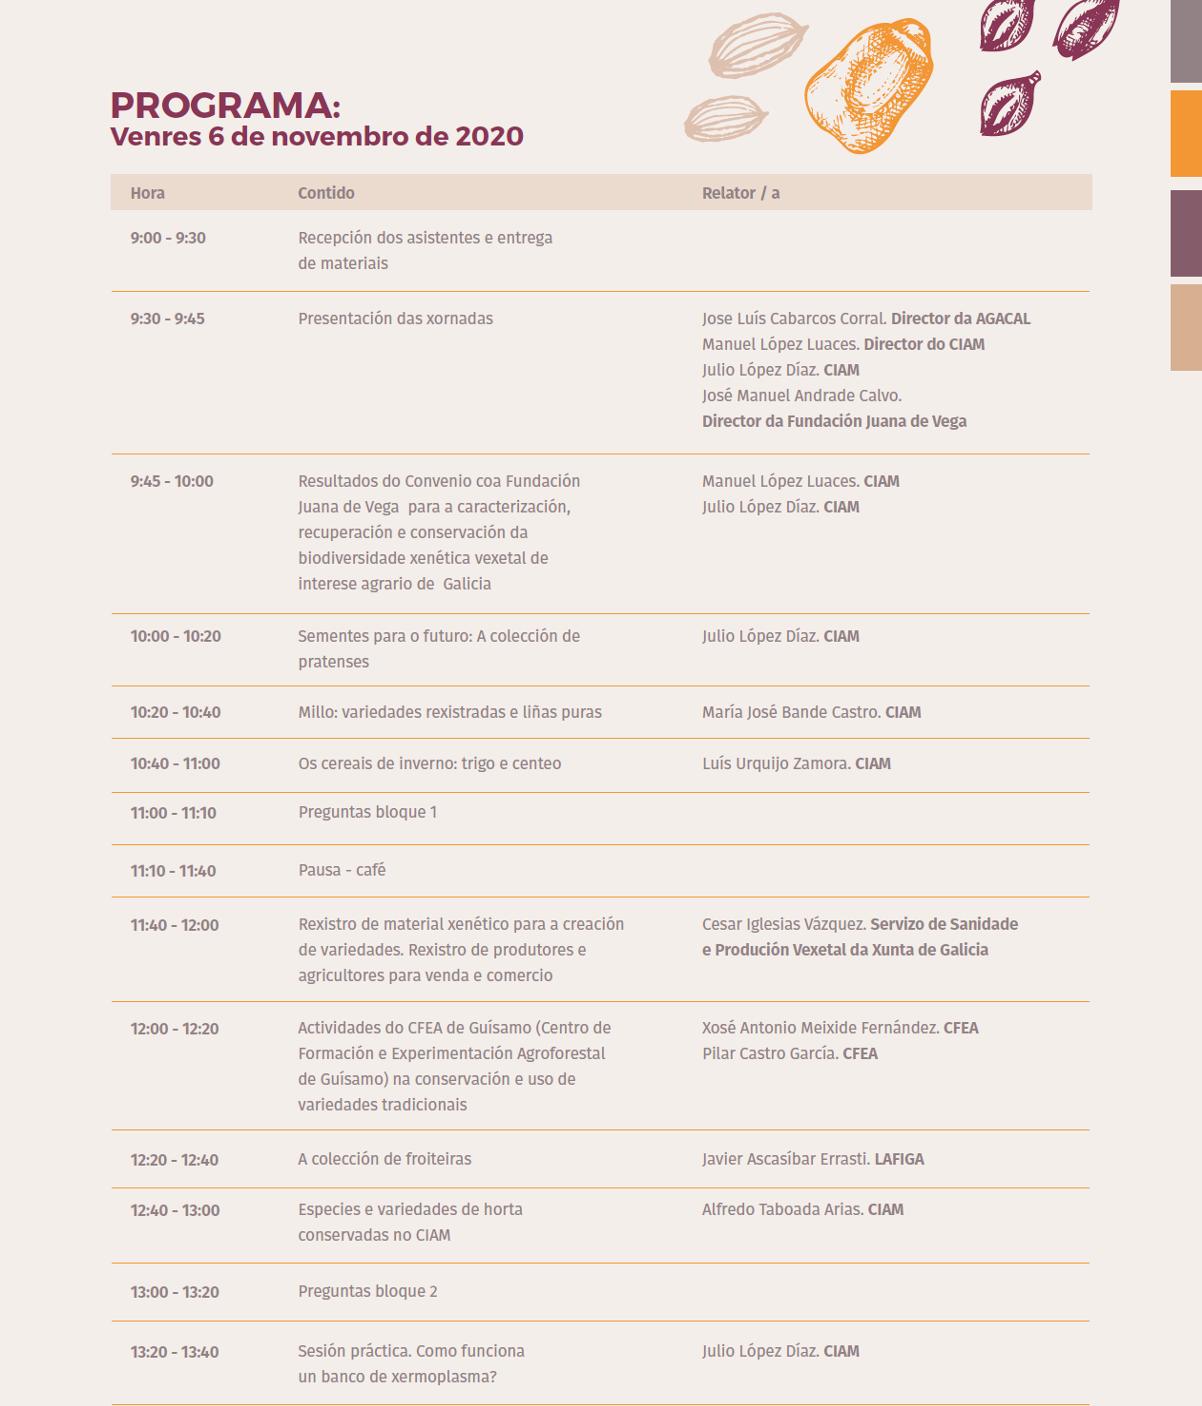 XORNADA JUANA DE VEGA CIAM programa